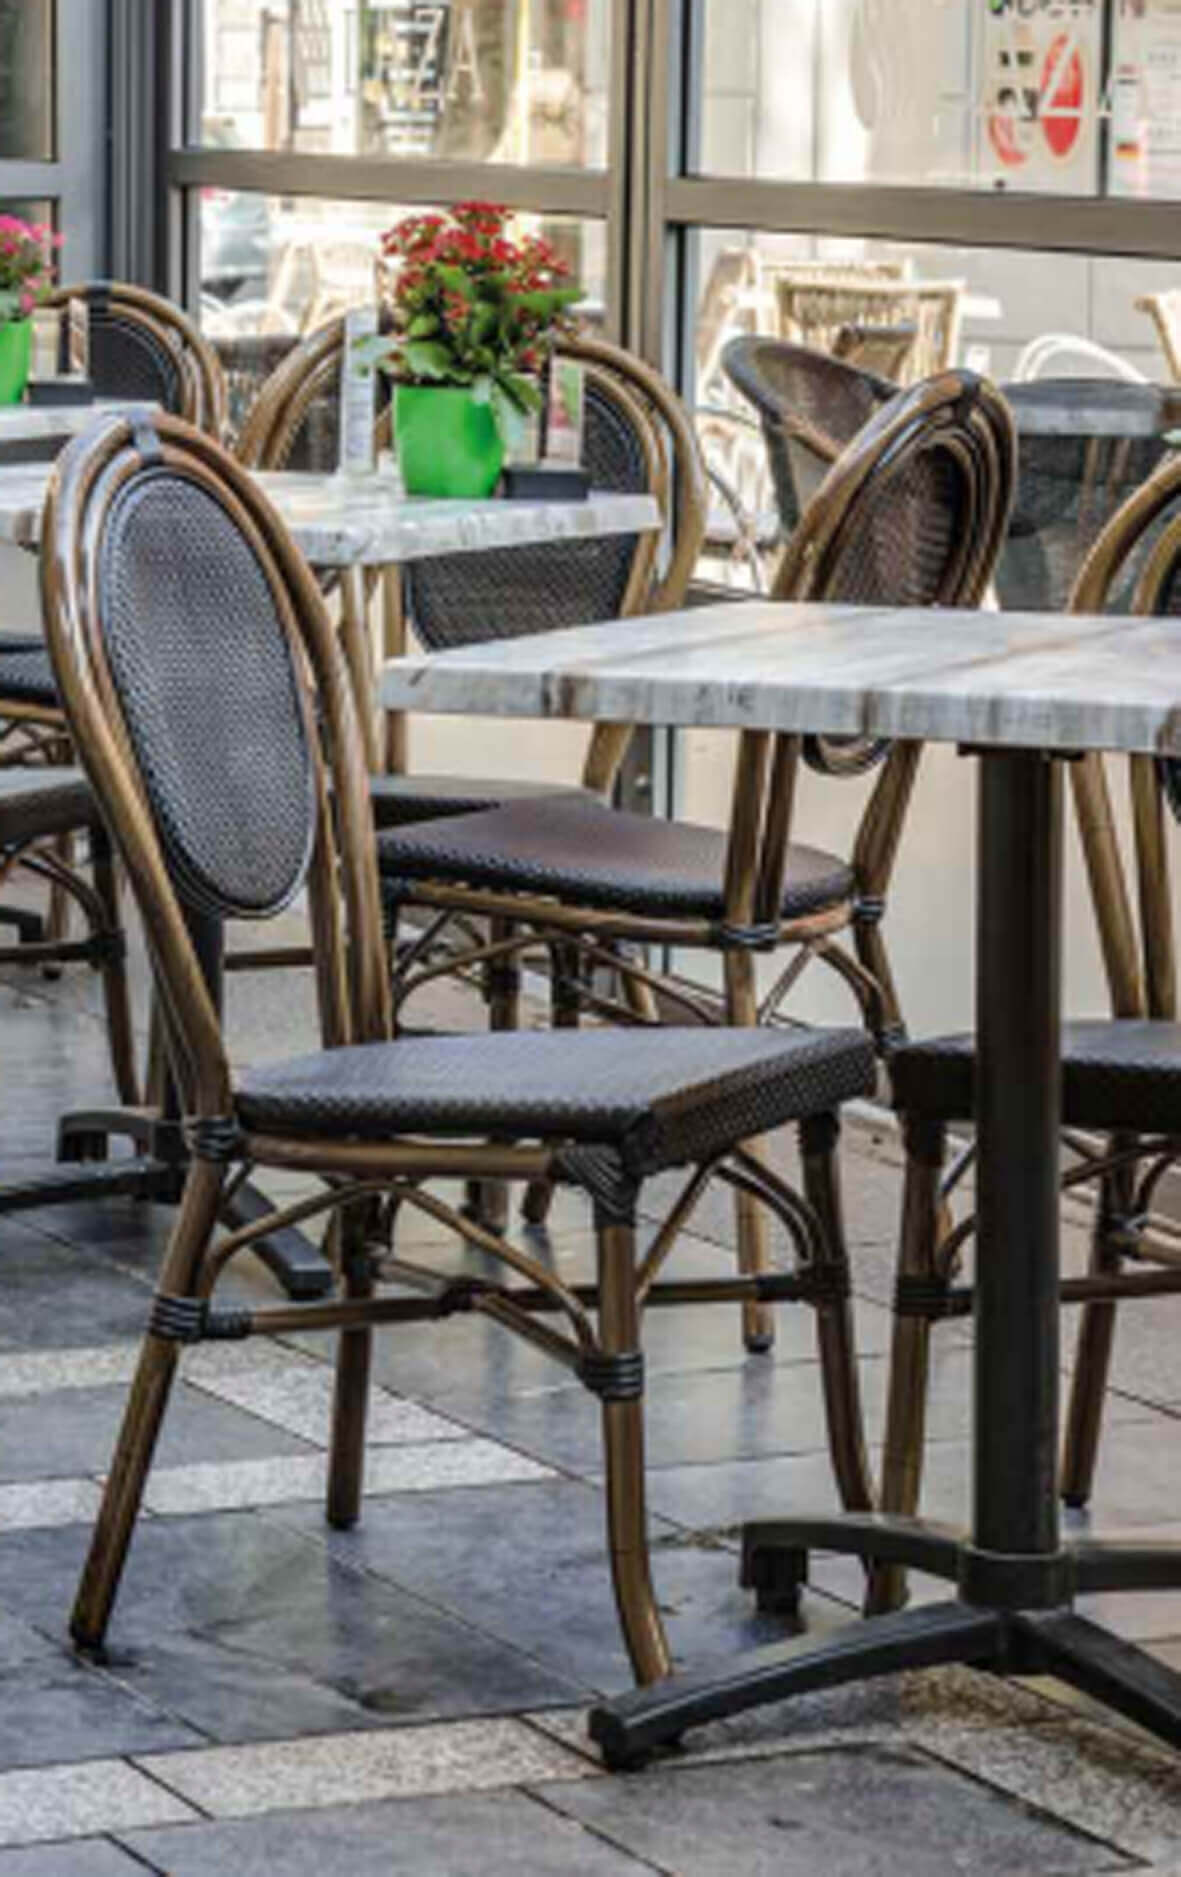 destymob societe de creation mobilier de terrasse chaise aluminium. Black Bedroom Furniture Sets. Home Design Ideas